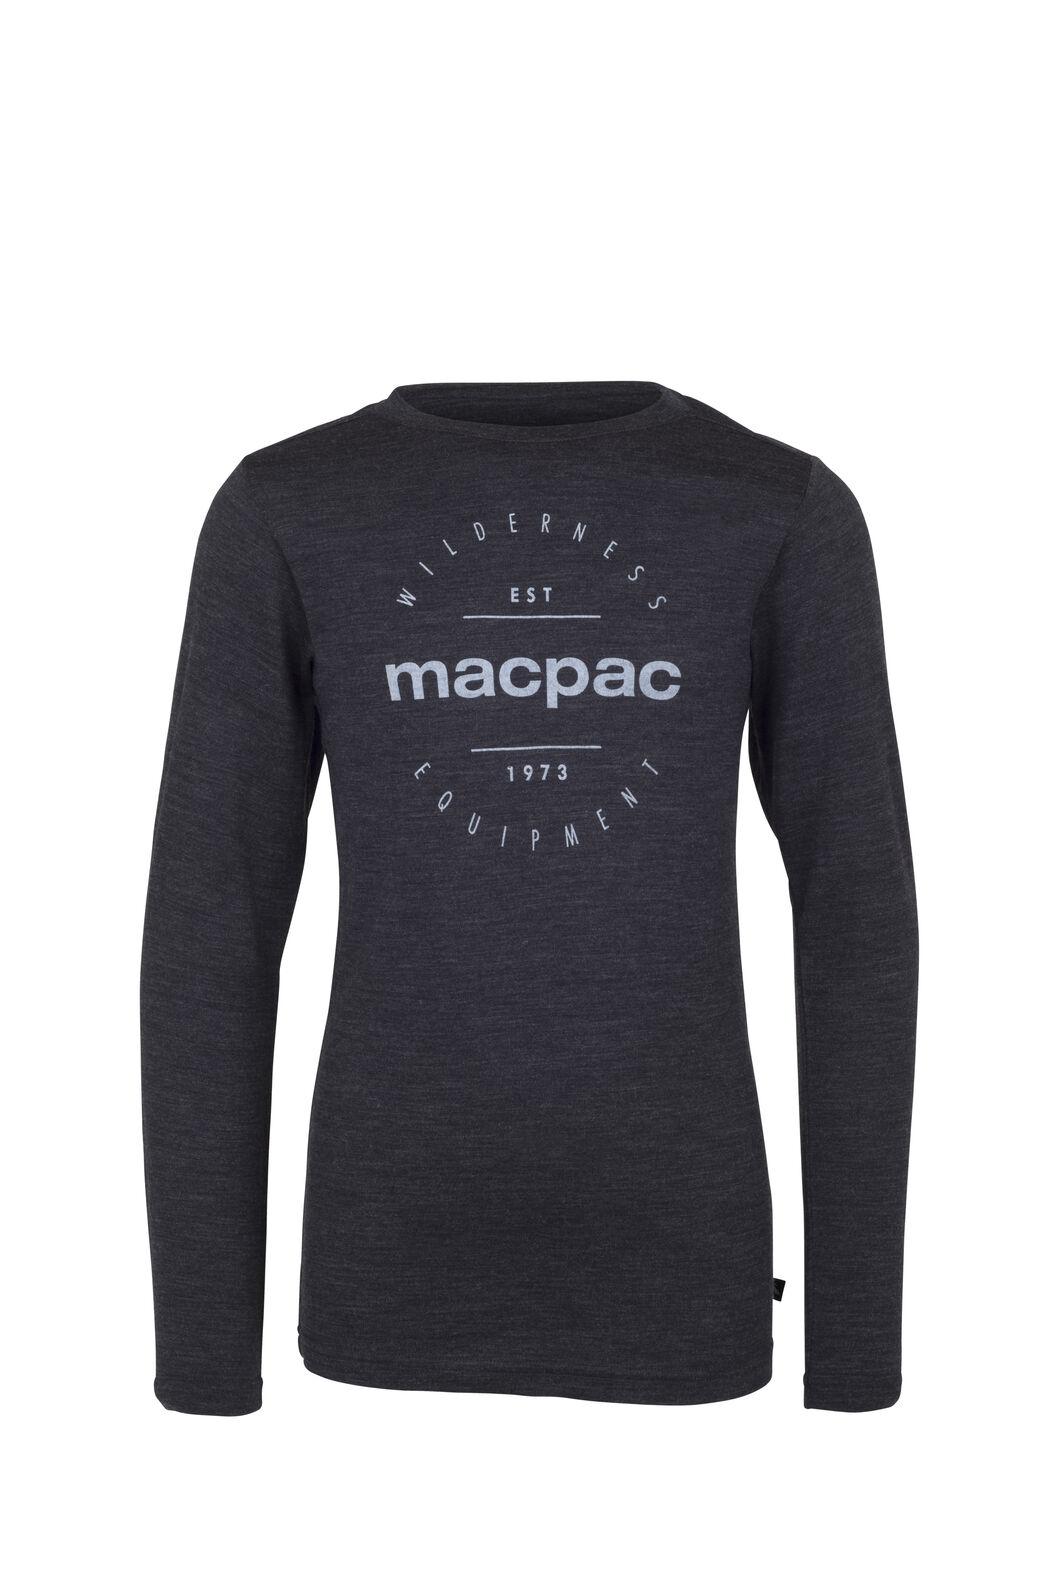 Macpac Merino 180 Long Sleeve Crew - Kids', Charcoal Marle, hi-res